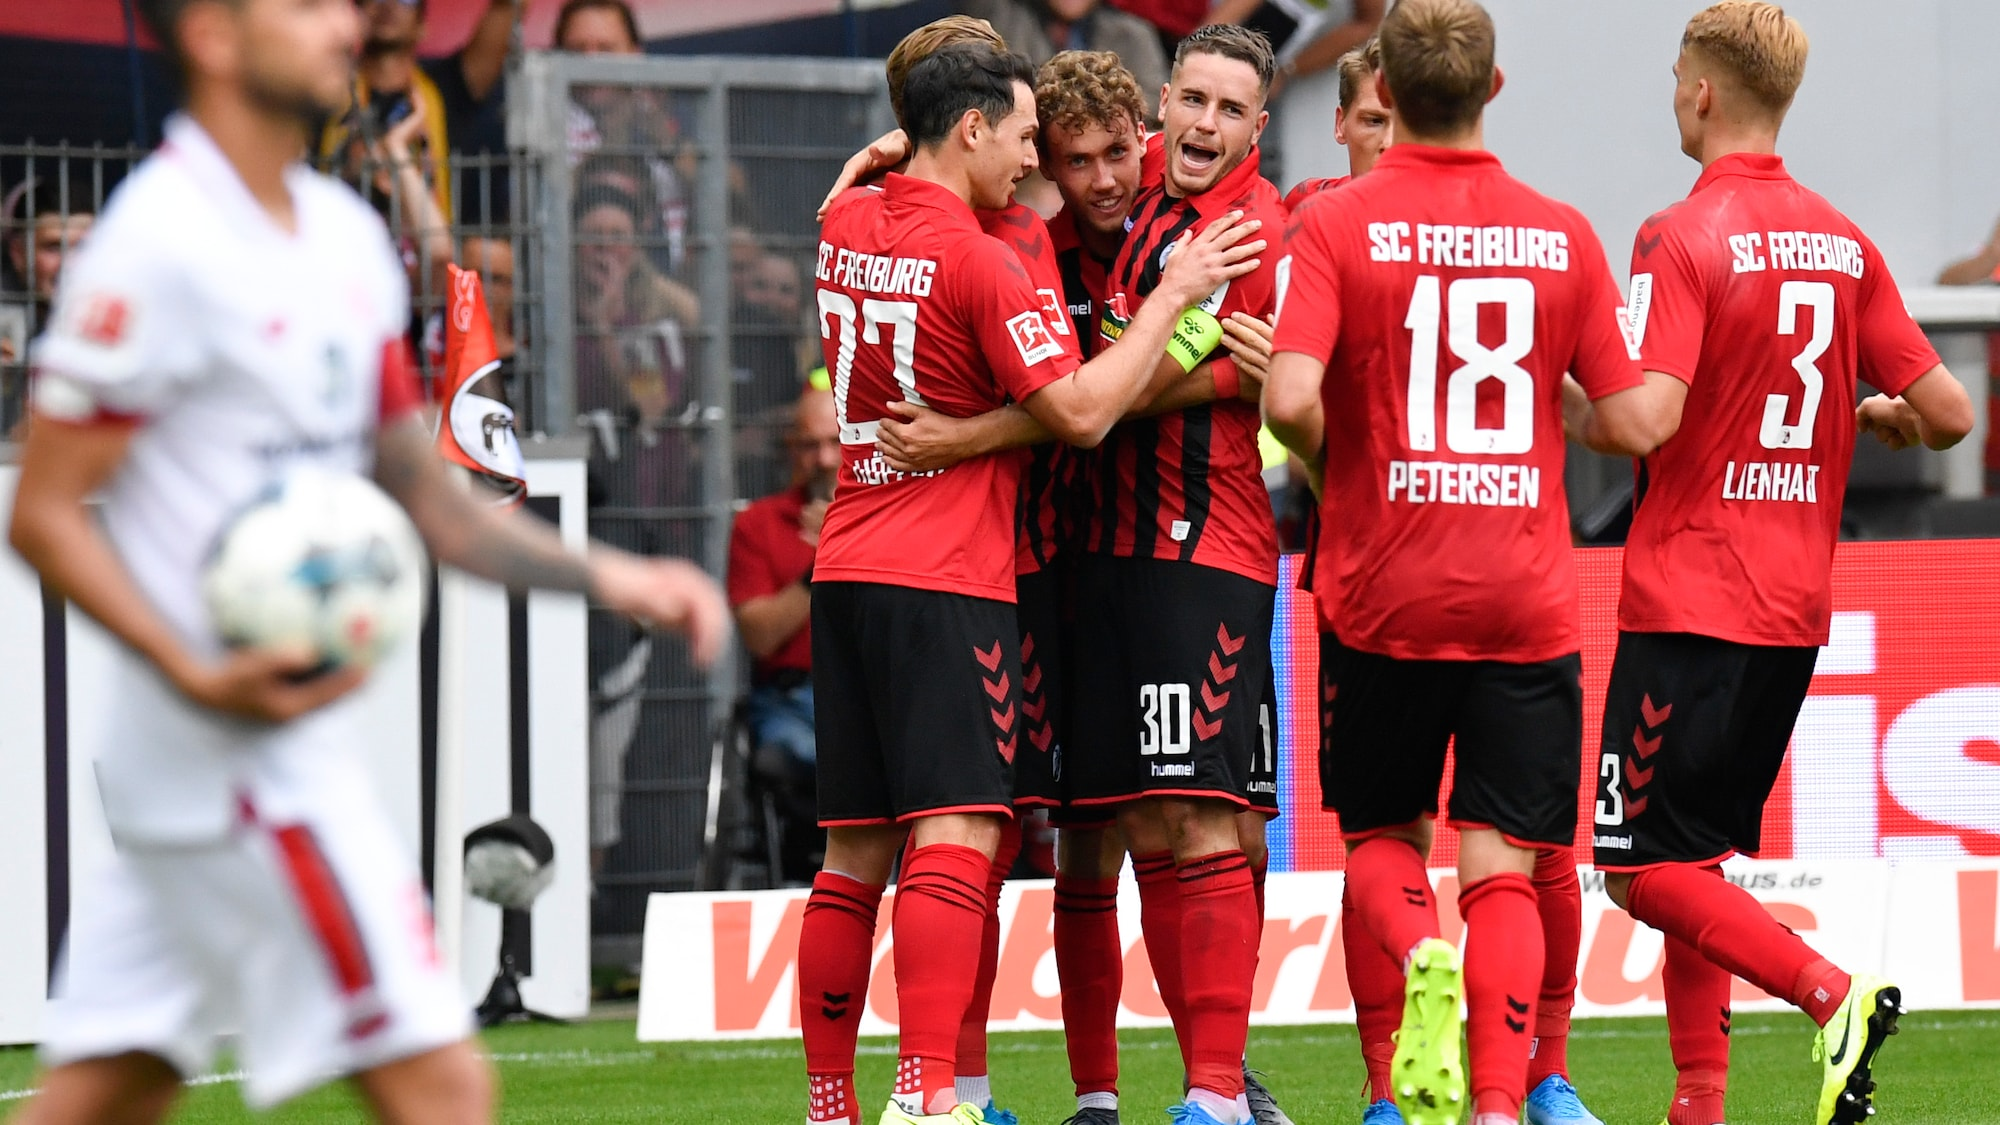 Dank drei Toren in sechs Minuten: Freiburg feiert lockeren Auftakt-Sieg gegen Mainz